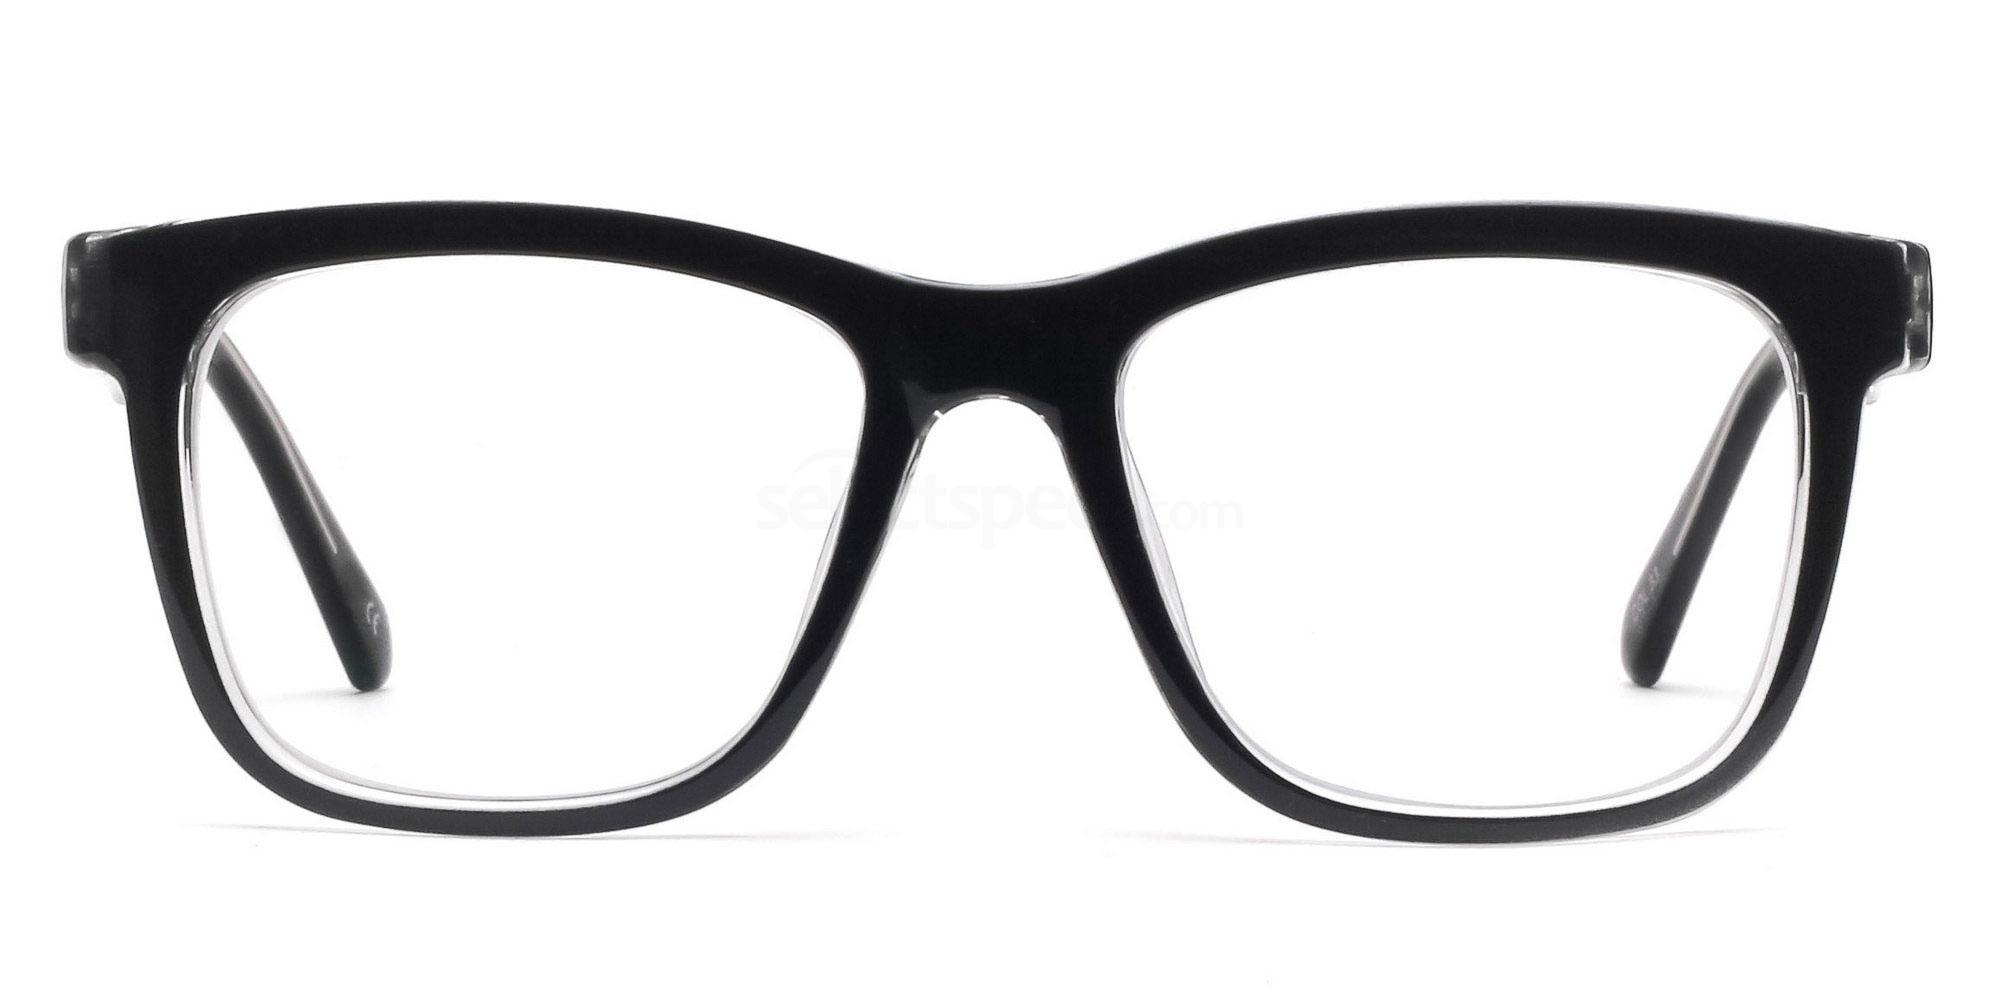 cheap geek chic glasses uk women